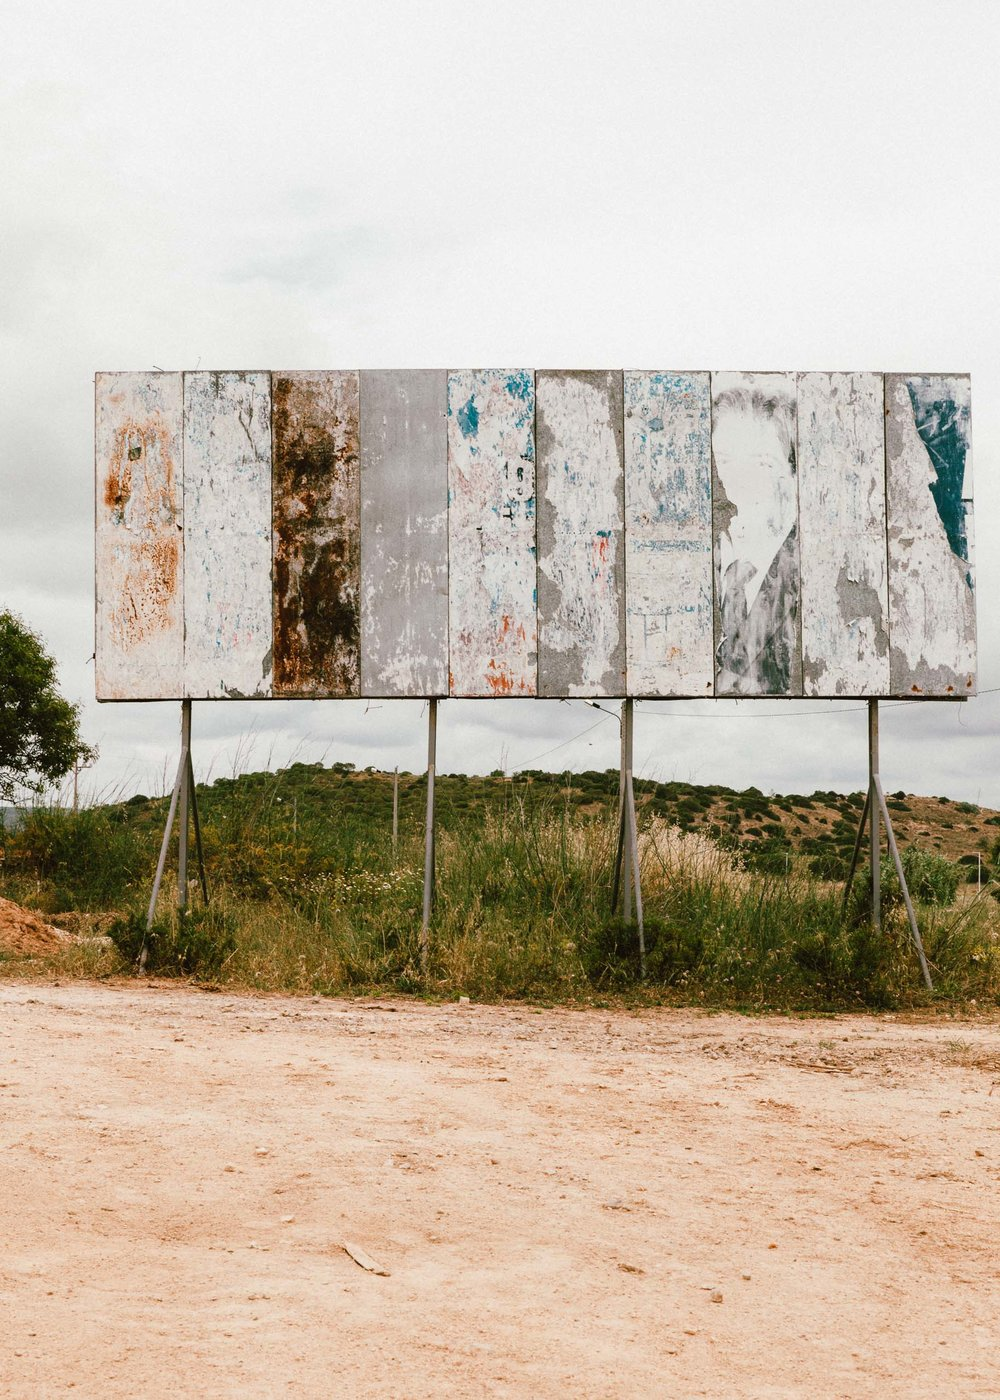 MaxHartmannphoto_Algarve2017-2618.jpg